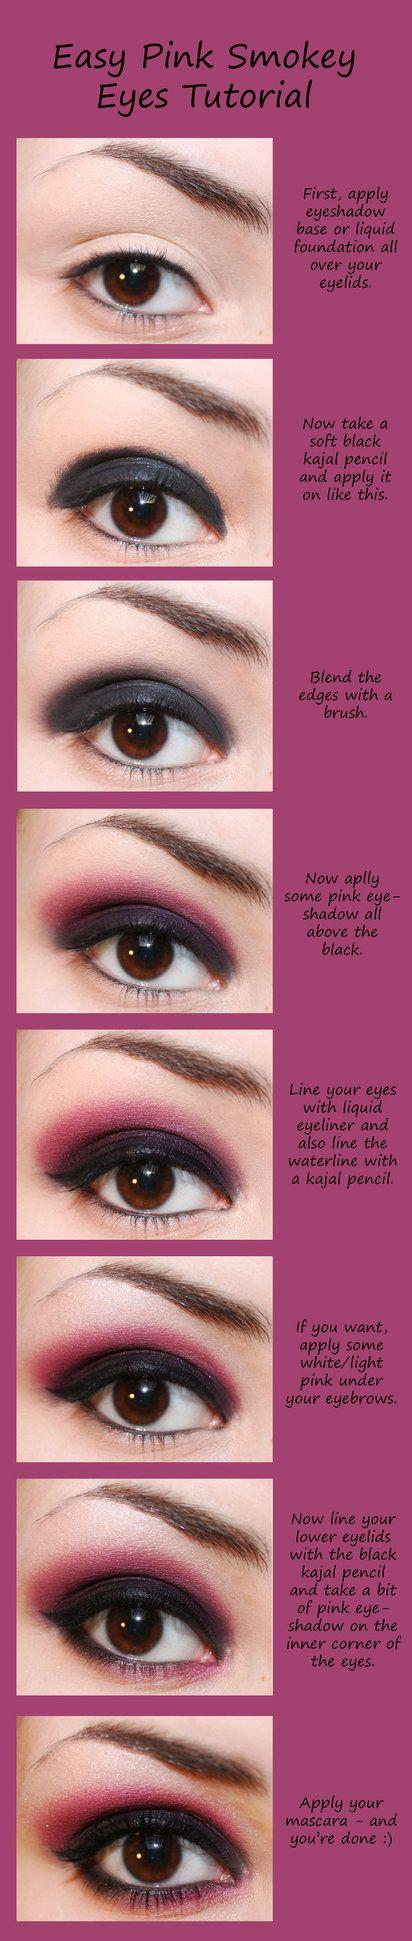 Easy Pink Smokey Eyes Tutorial by *hedwyg23 on deviantART